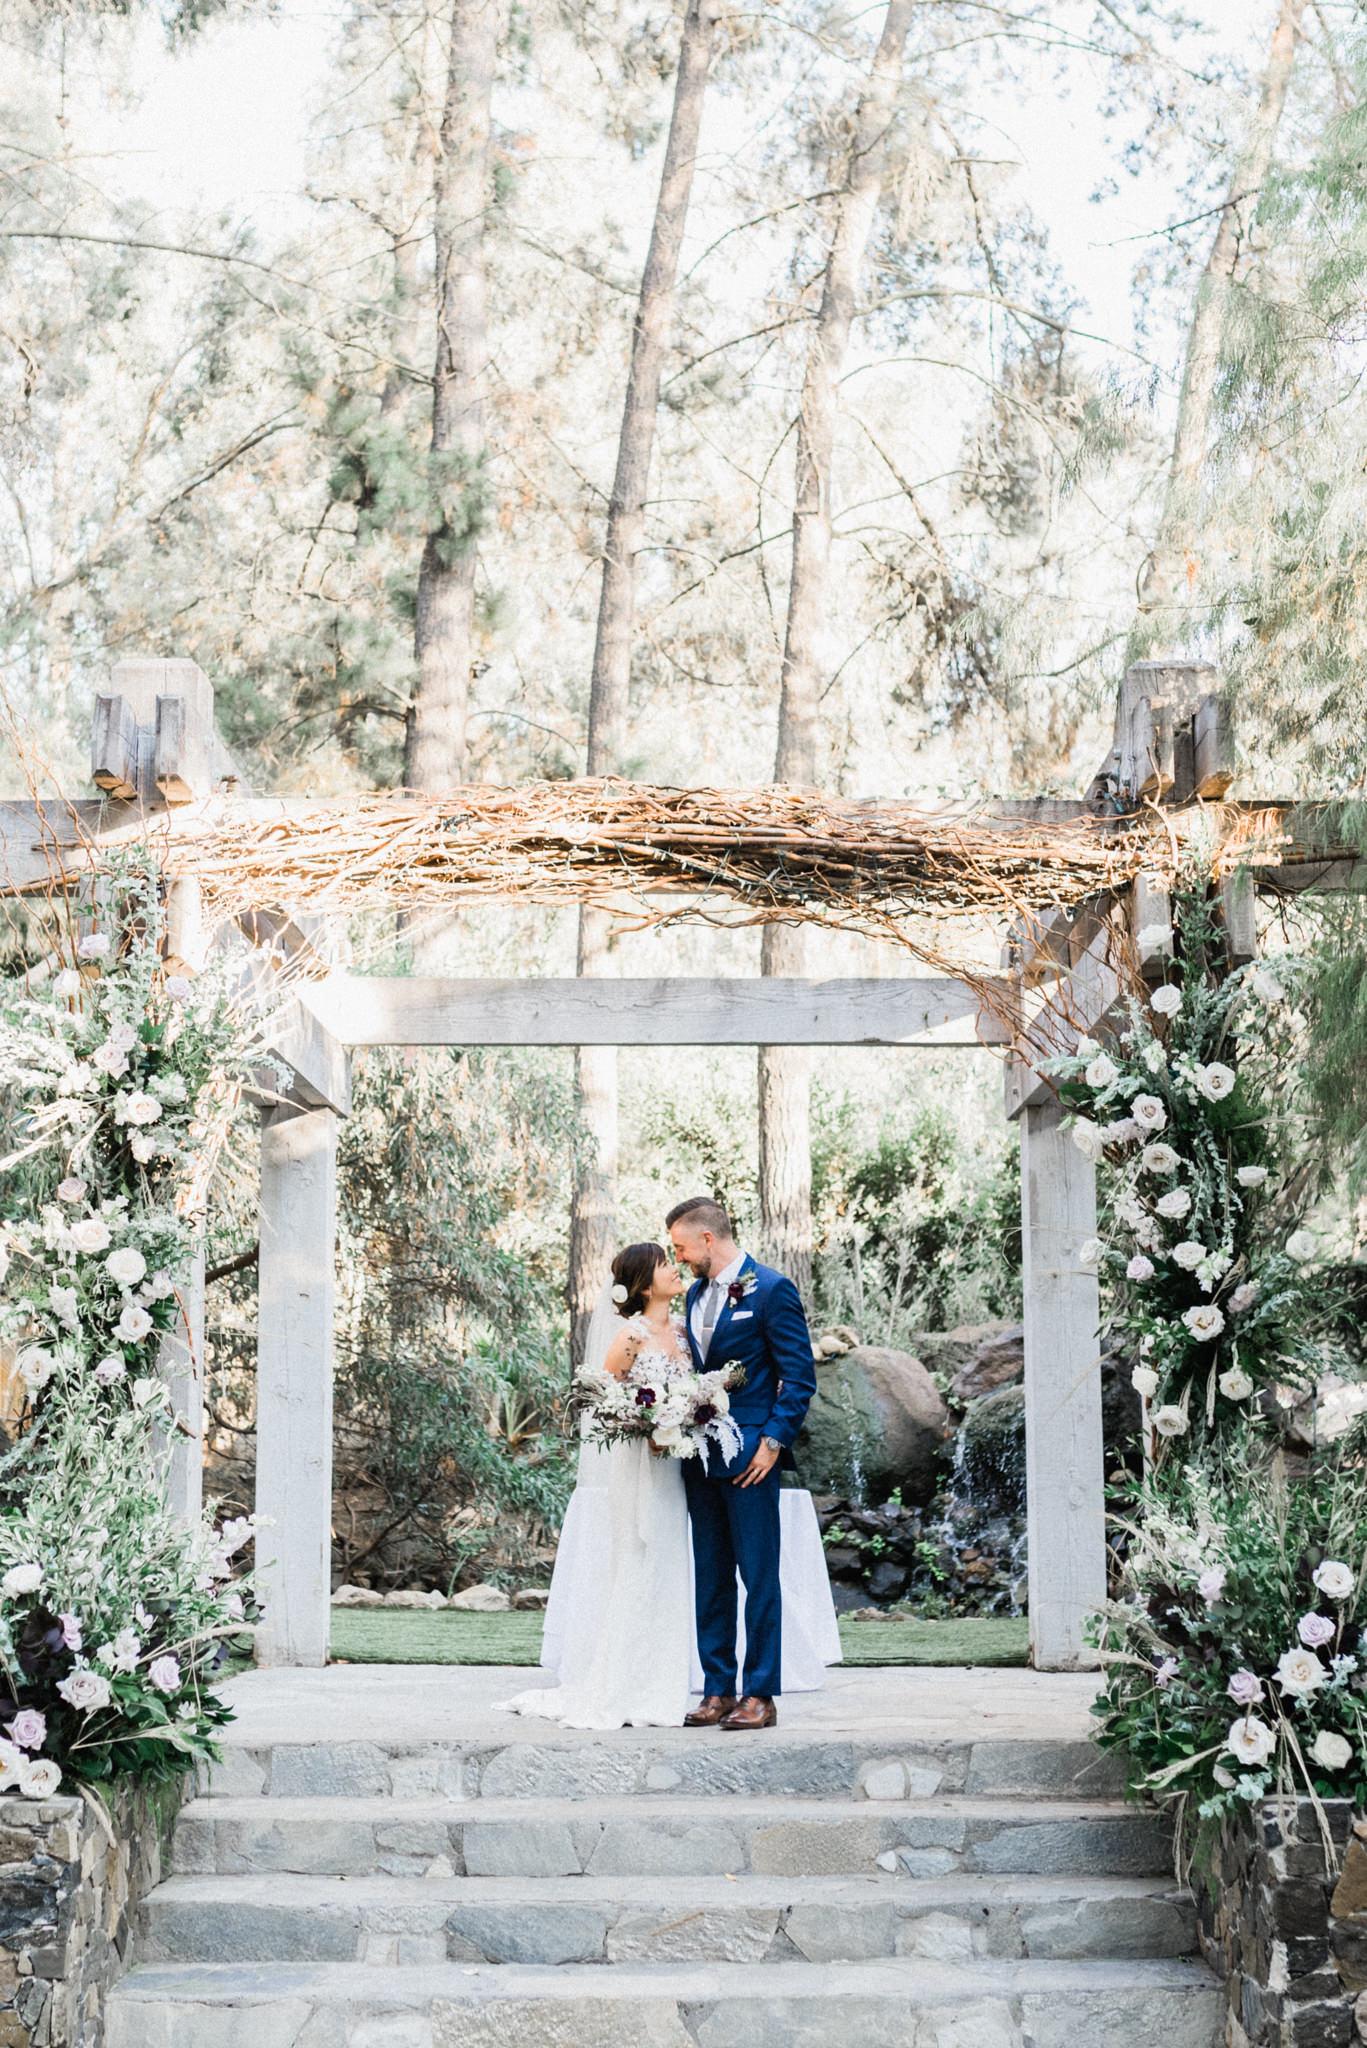 Calamigos-Ranch-Malibu-Wedding-Photographer-190.jpg